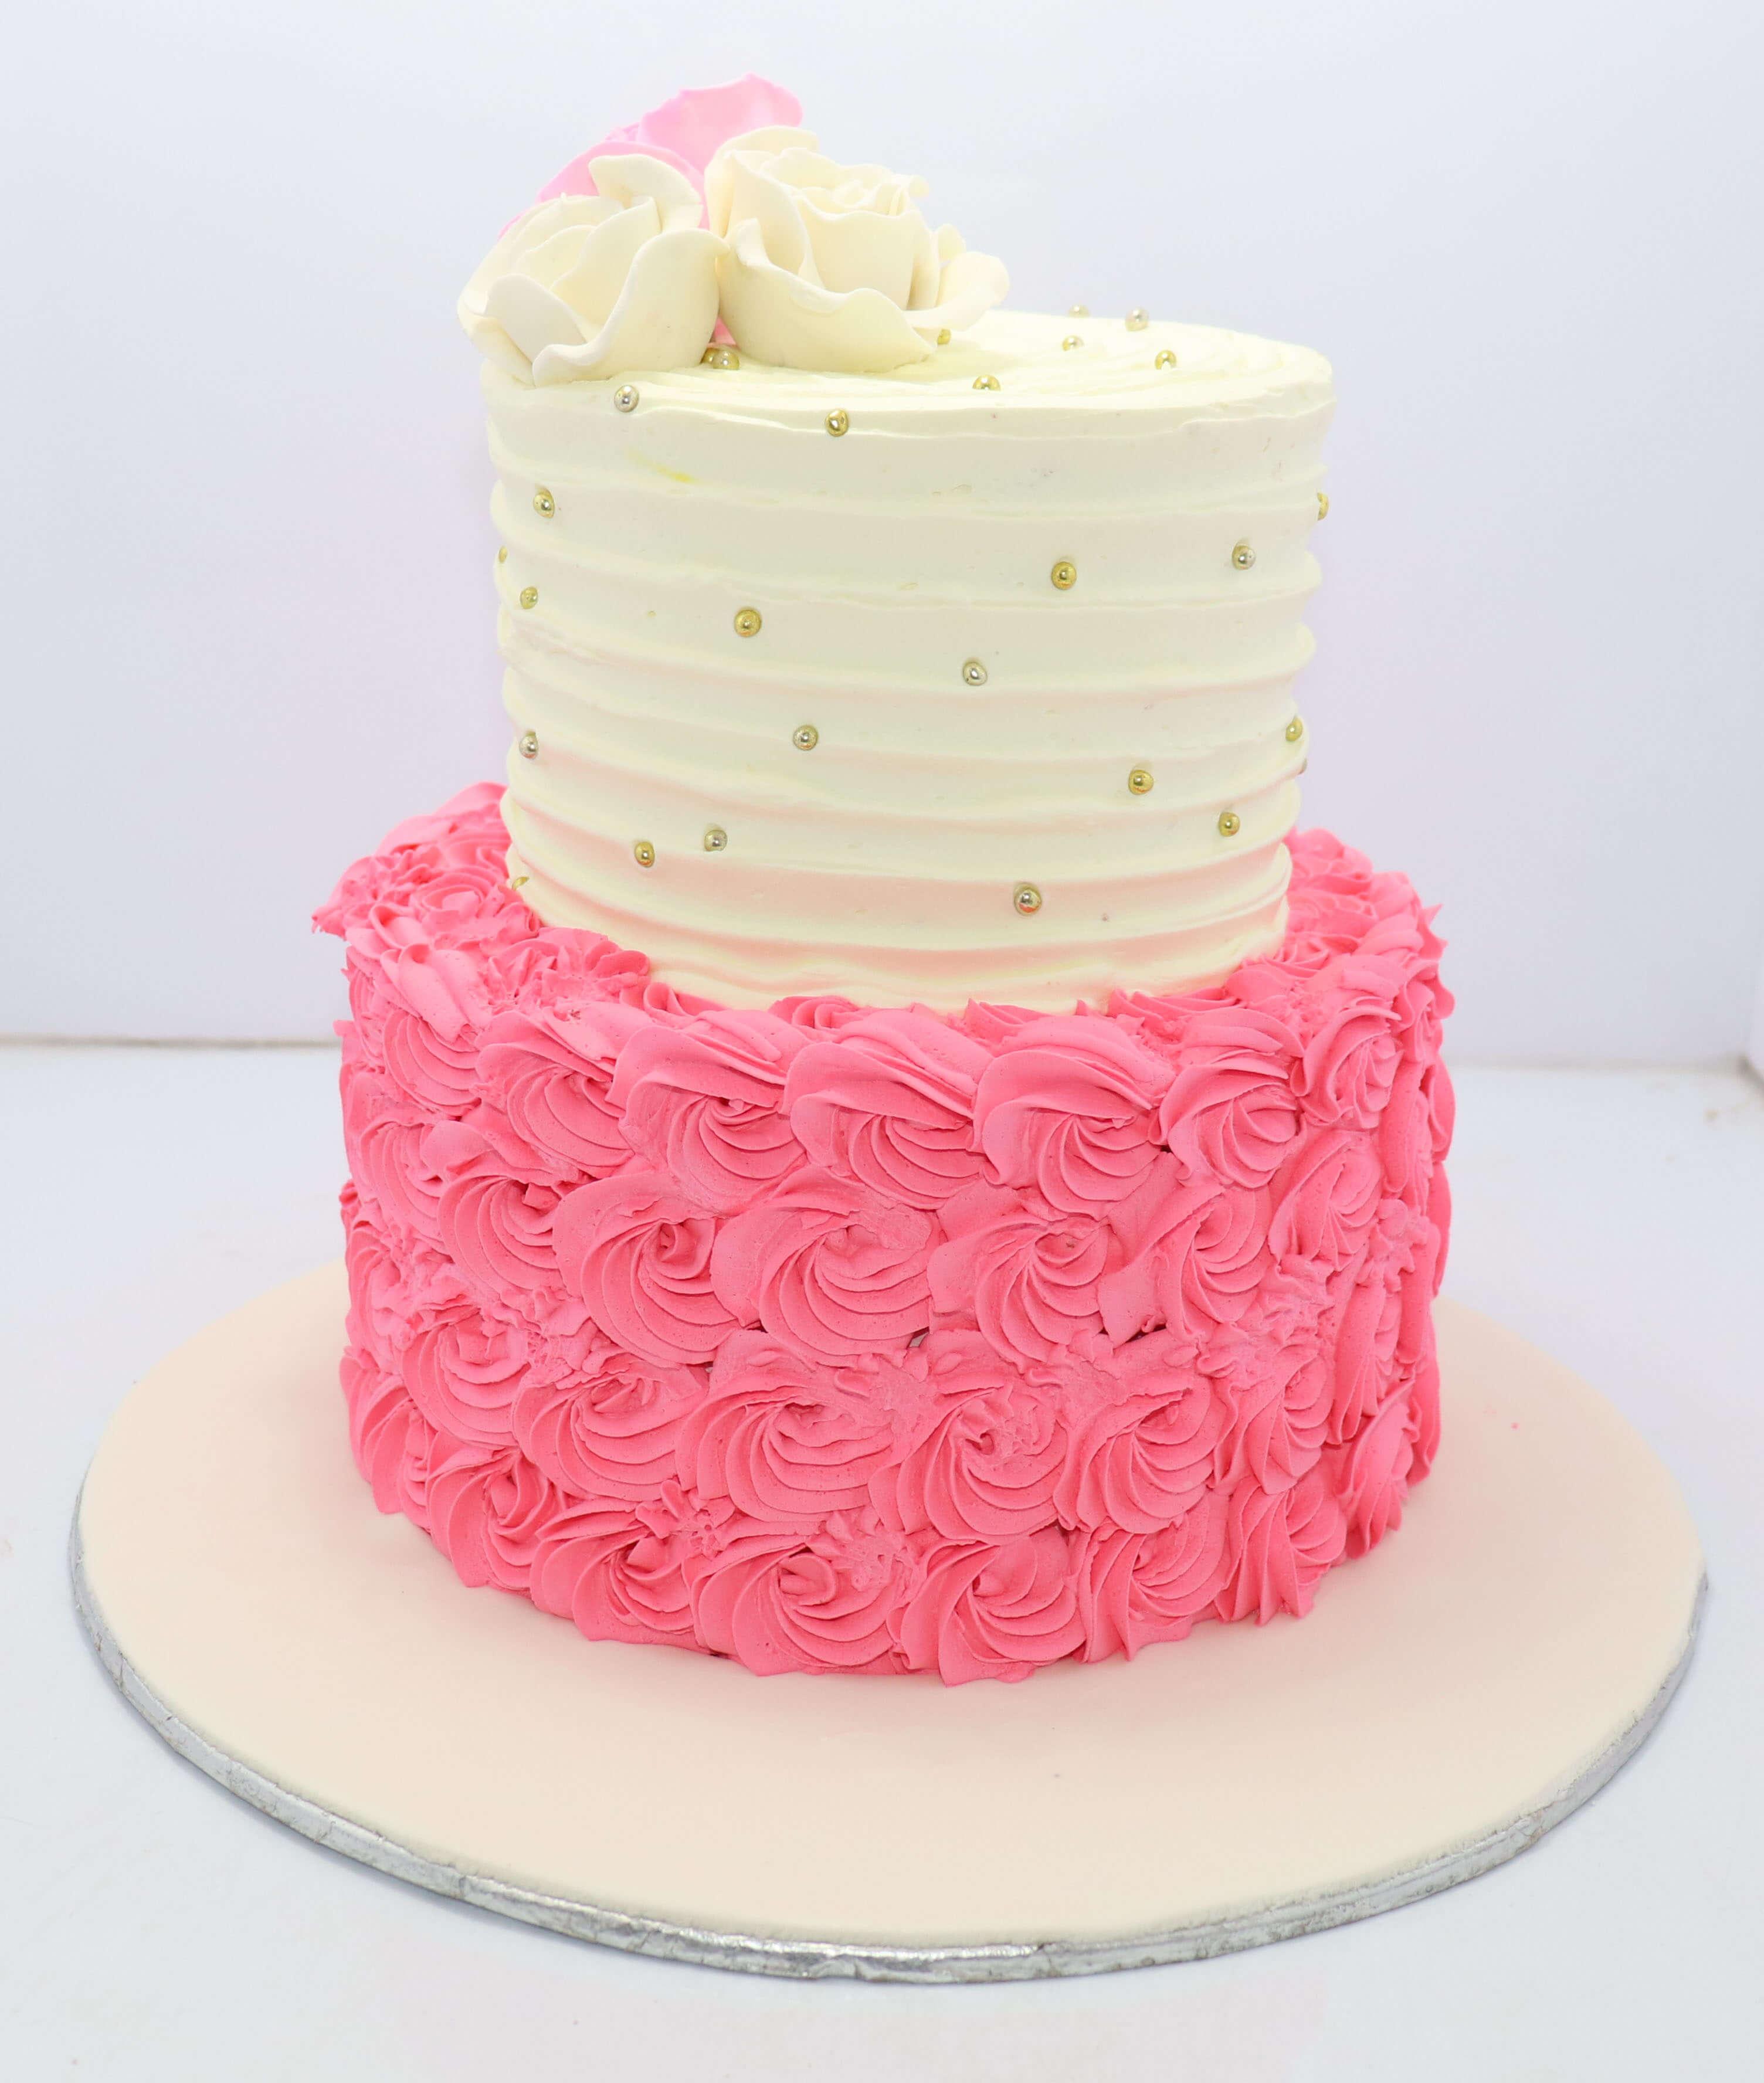 Amazing Pink Flowers Girls Birthday Cake Bakisto Pk Lahore Free Delivery Personalised Birthday Cards Beptaeletsinfo